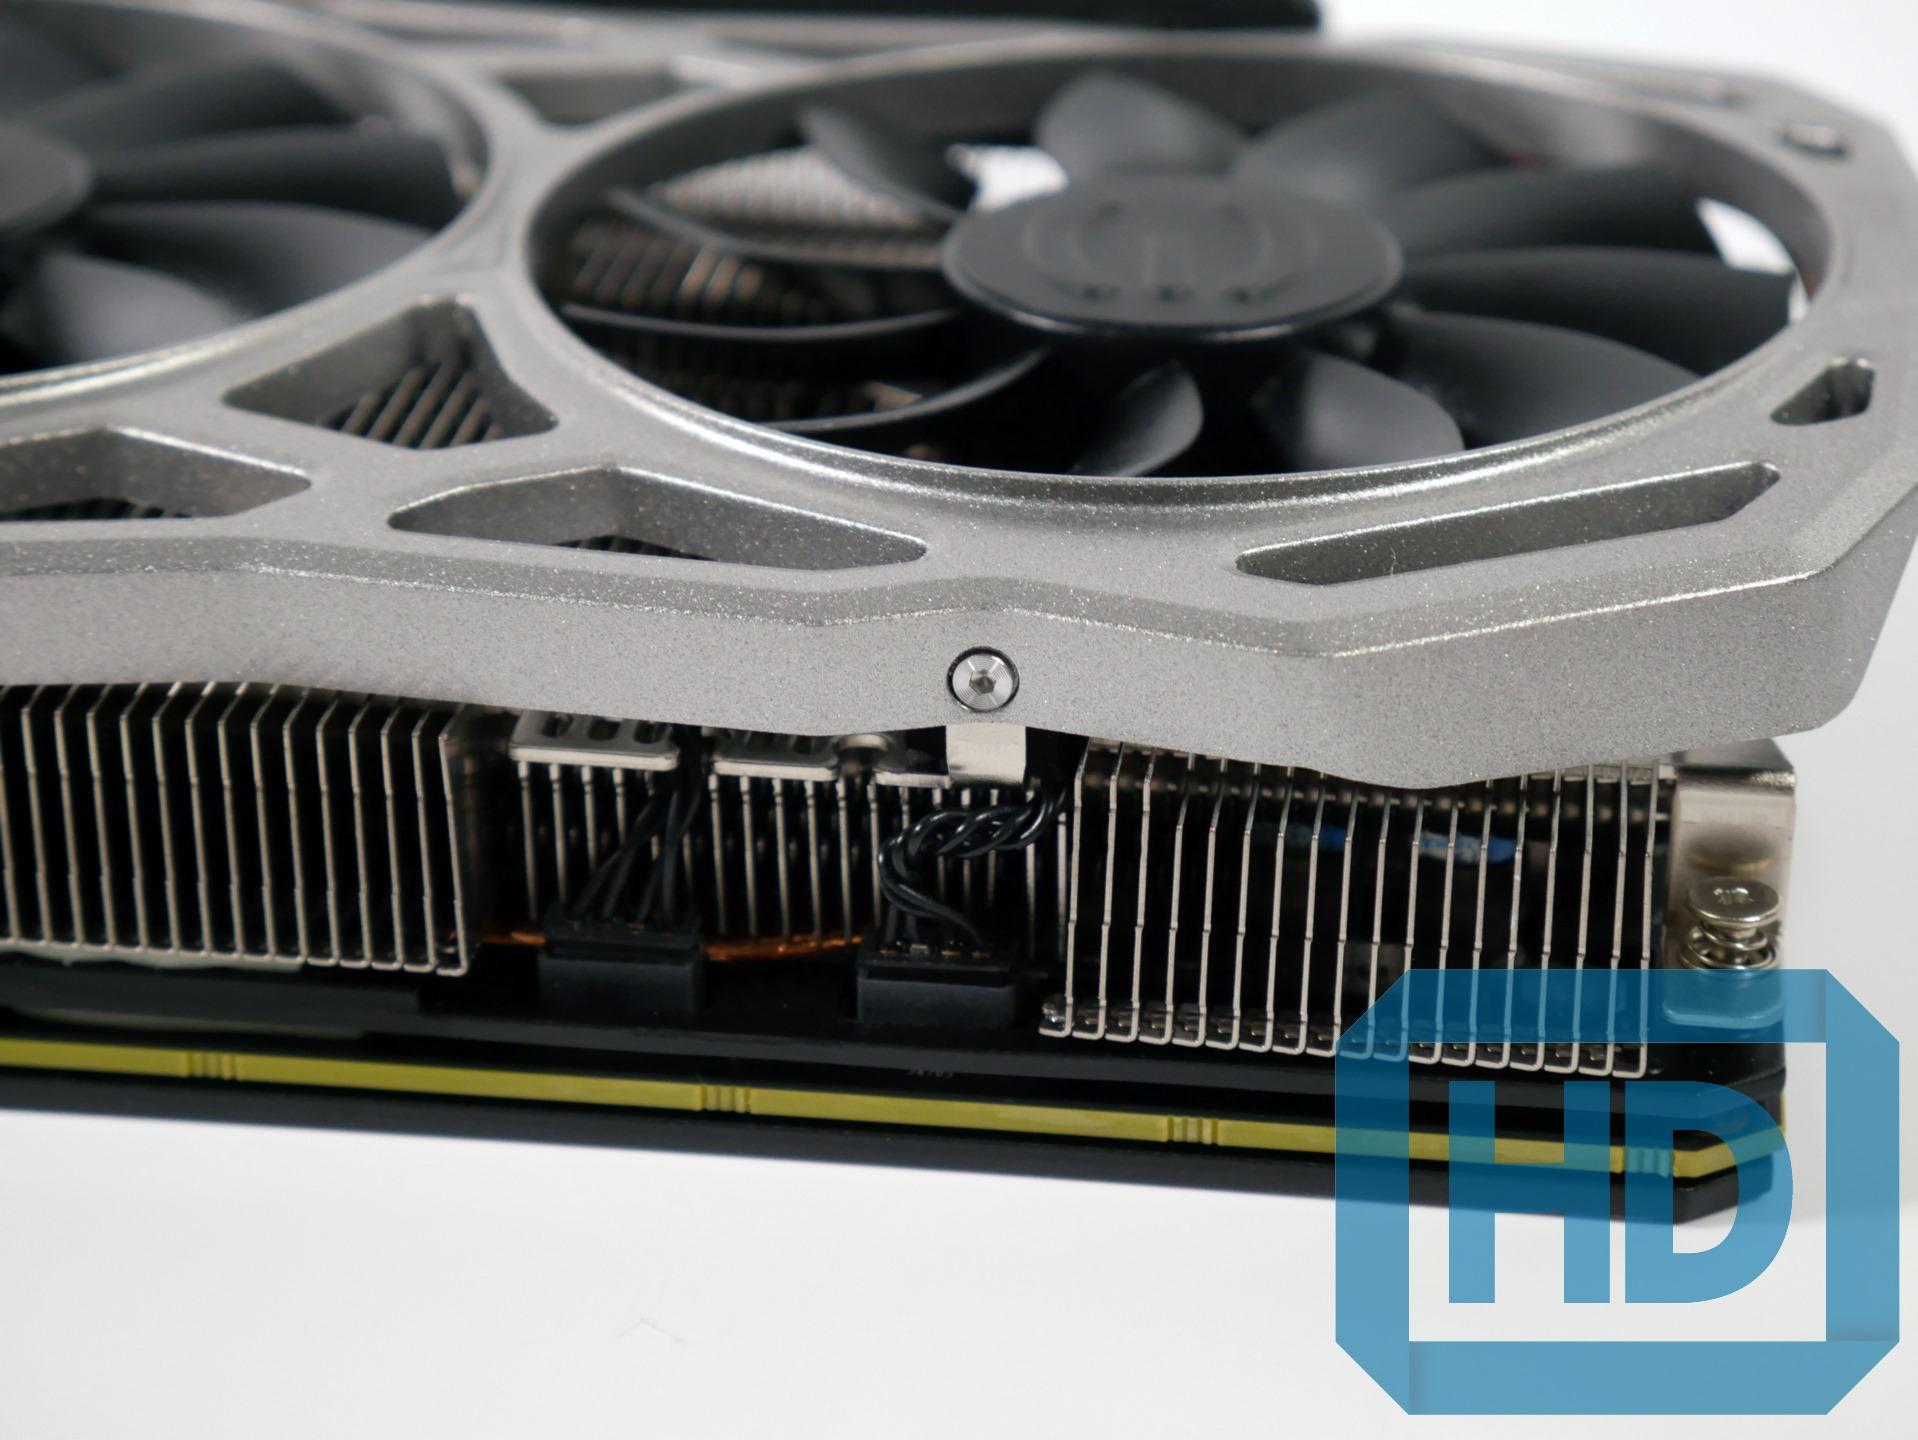 Review EVGA GeForce GTX 1080Ti FTW3 11GB